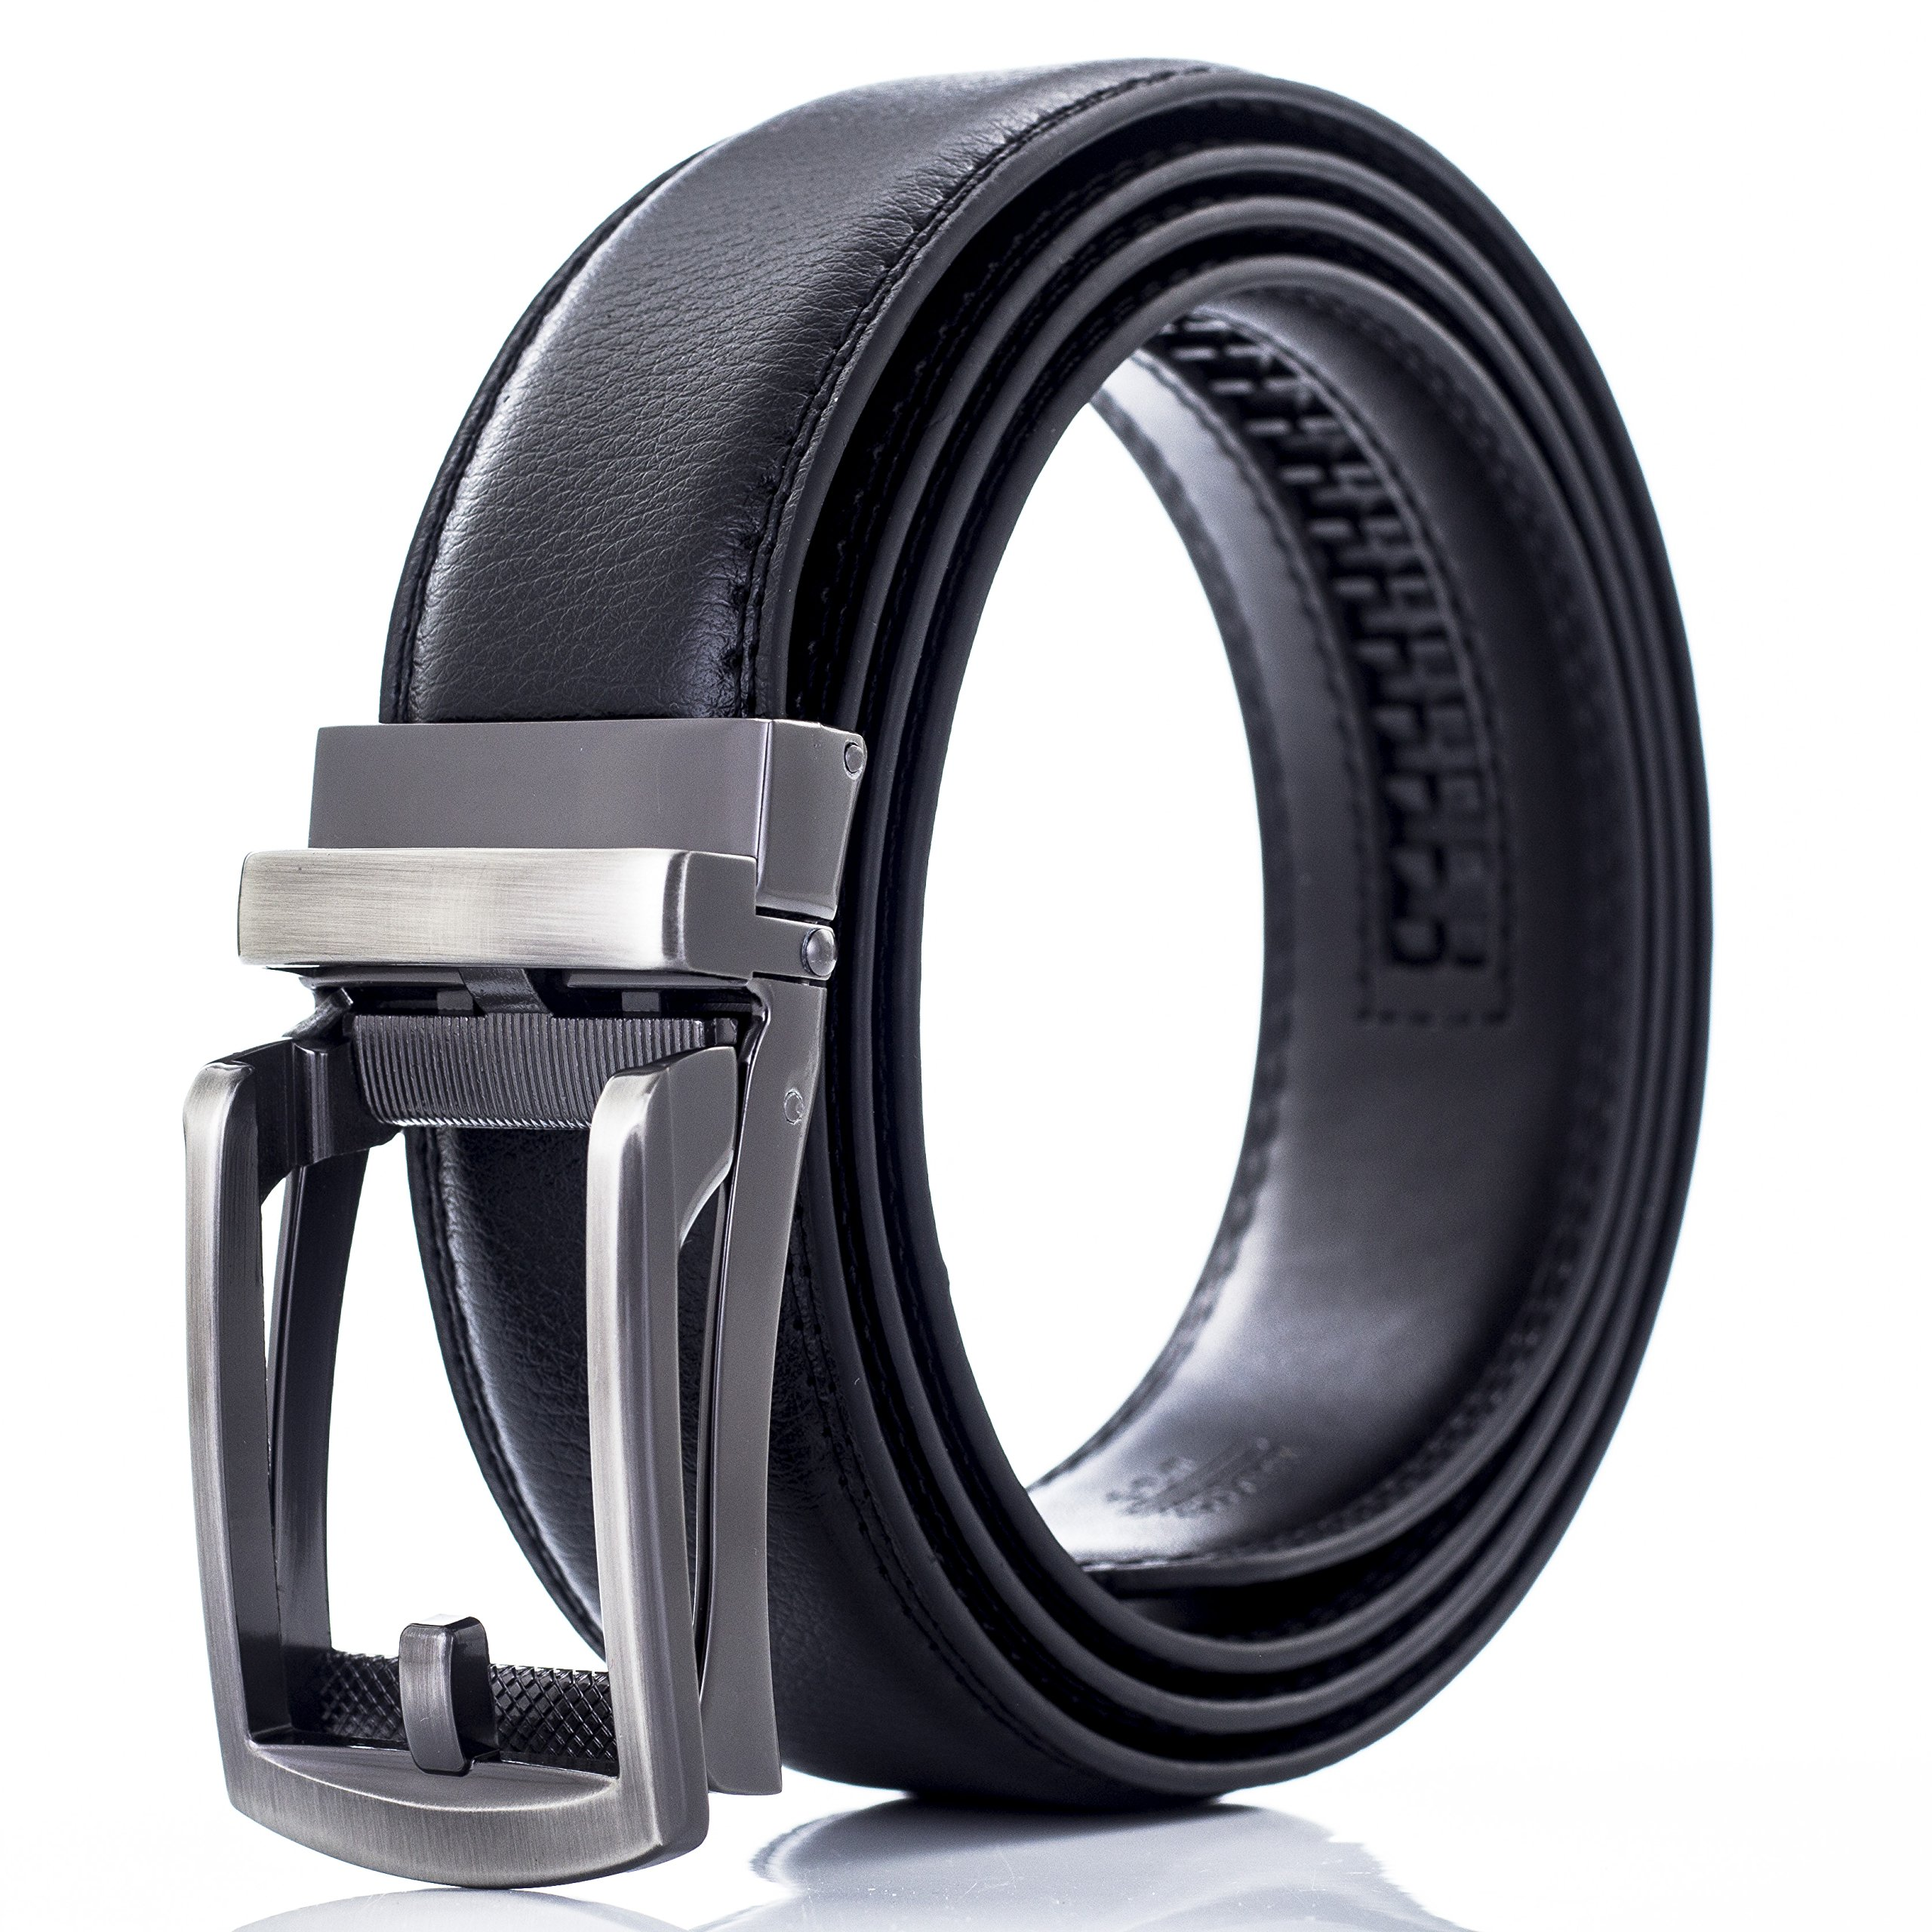 Automatic Ratchet Leather Belt For Men, Durable Alloy Metal Buckle, 35mm Wide DA04-BLK